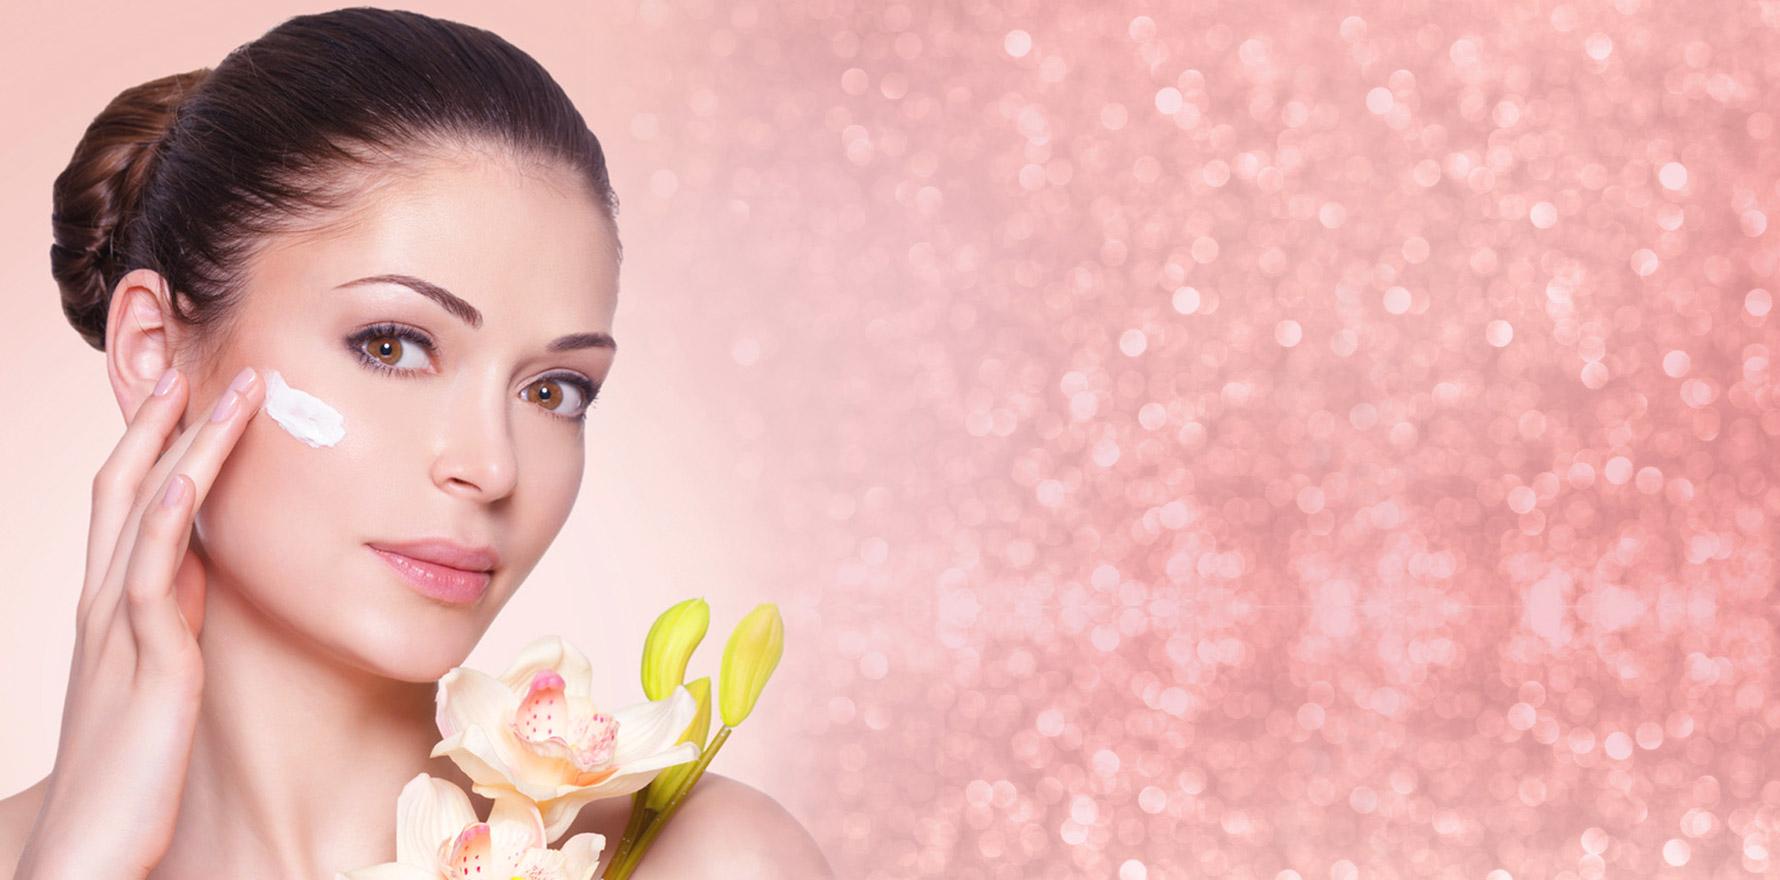 beauty salon, beauty clinic, hair dressing, beauty treatments